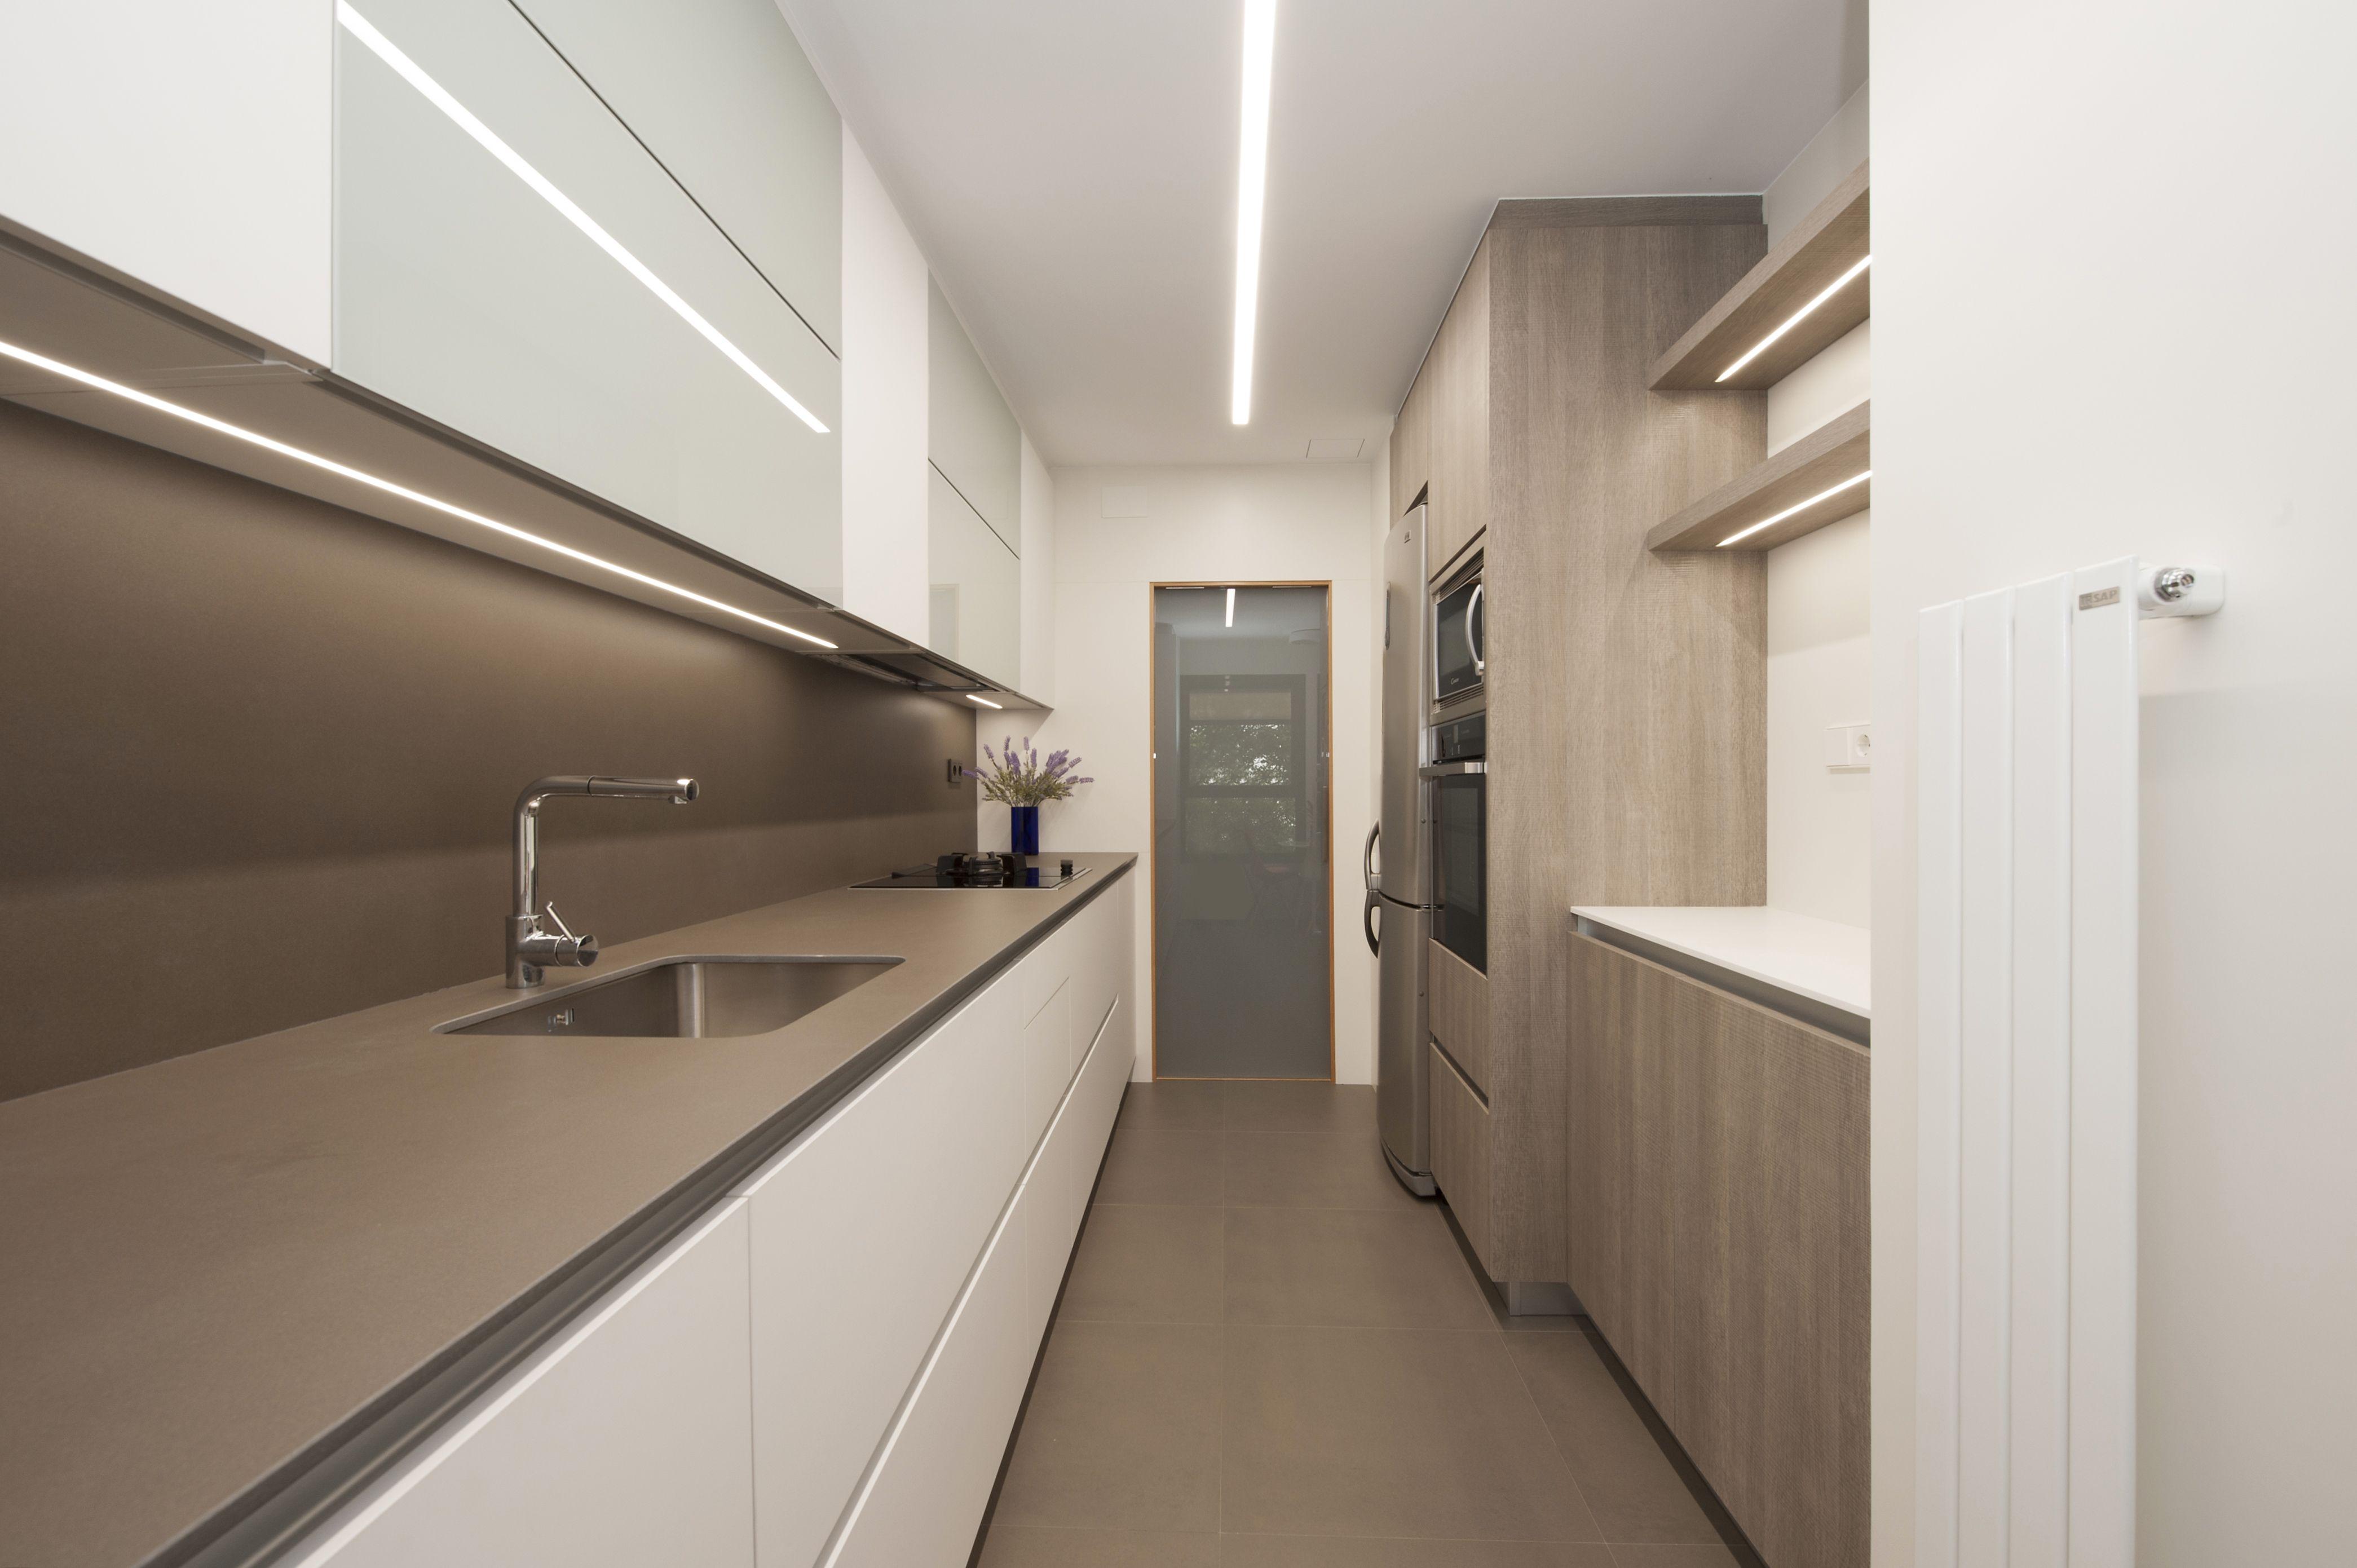 Cocina Con Dos Muros Paralelos Sincro Cocinas Kitchensramblara Decoracion De Cocina Diseno De Interiores De Cocina Mobiliario De Cocina